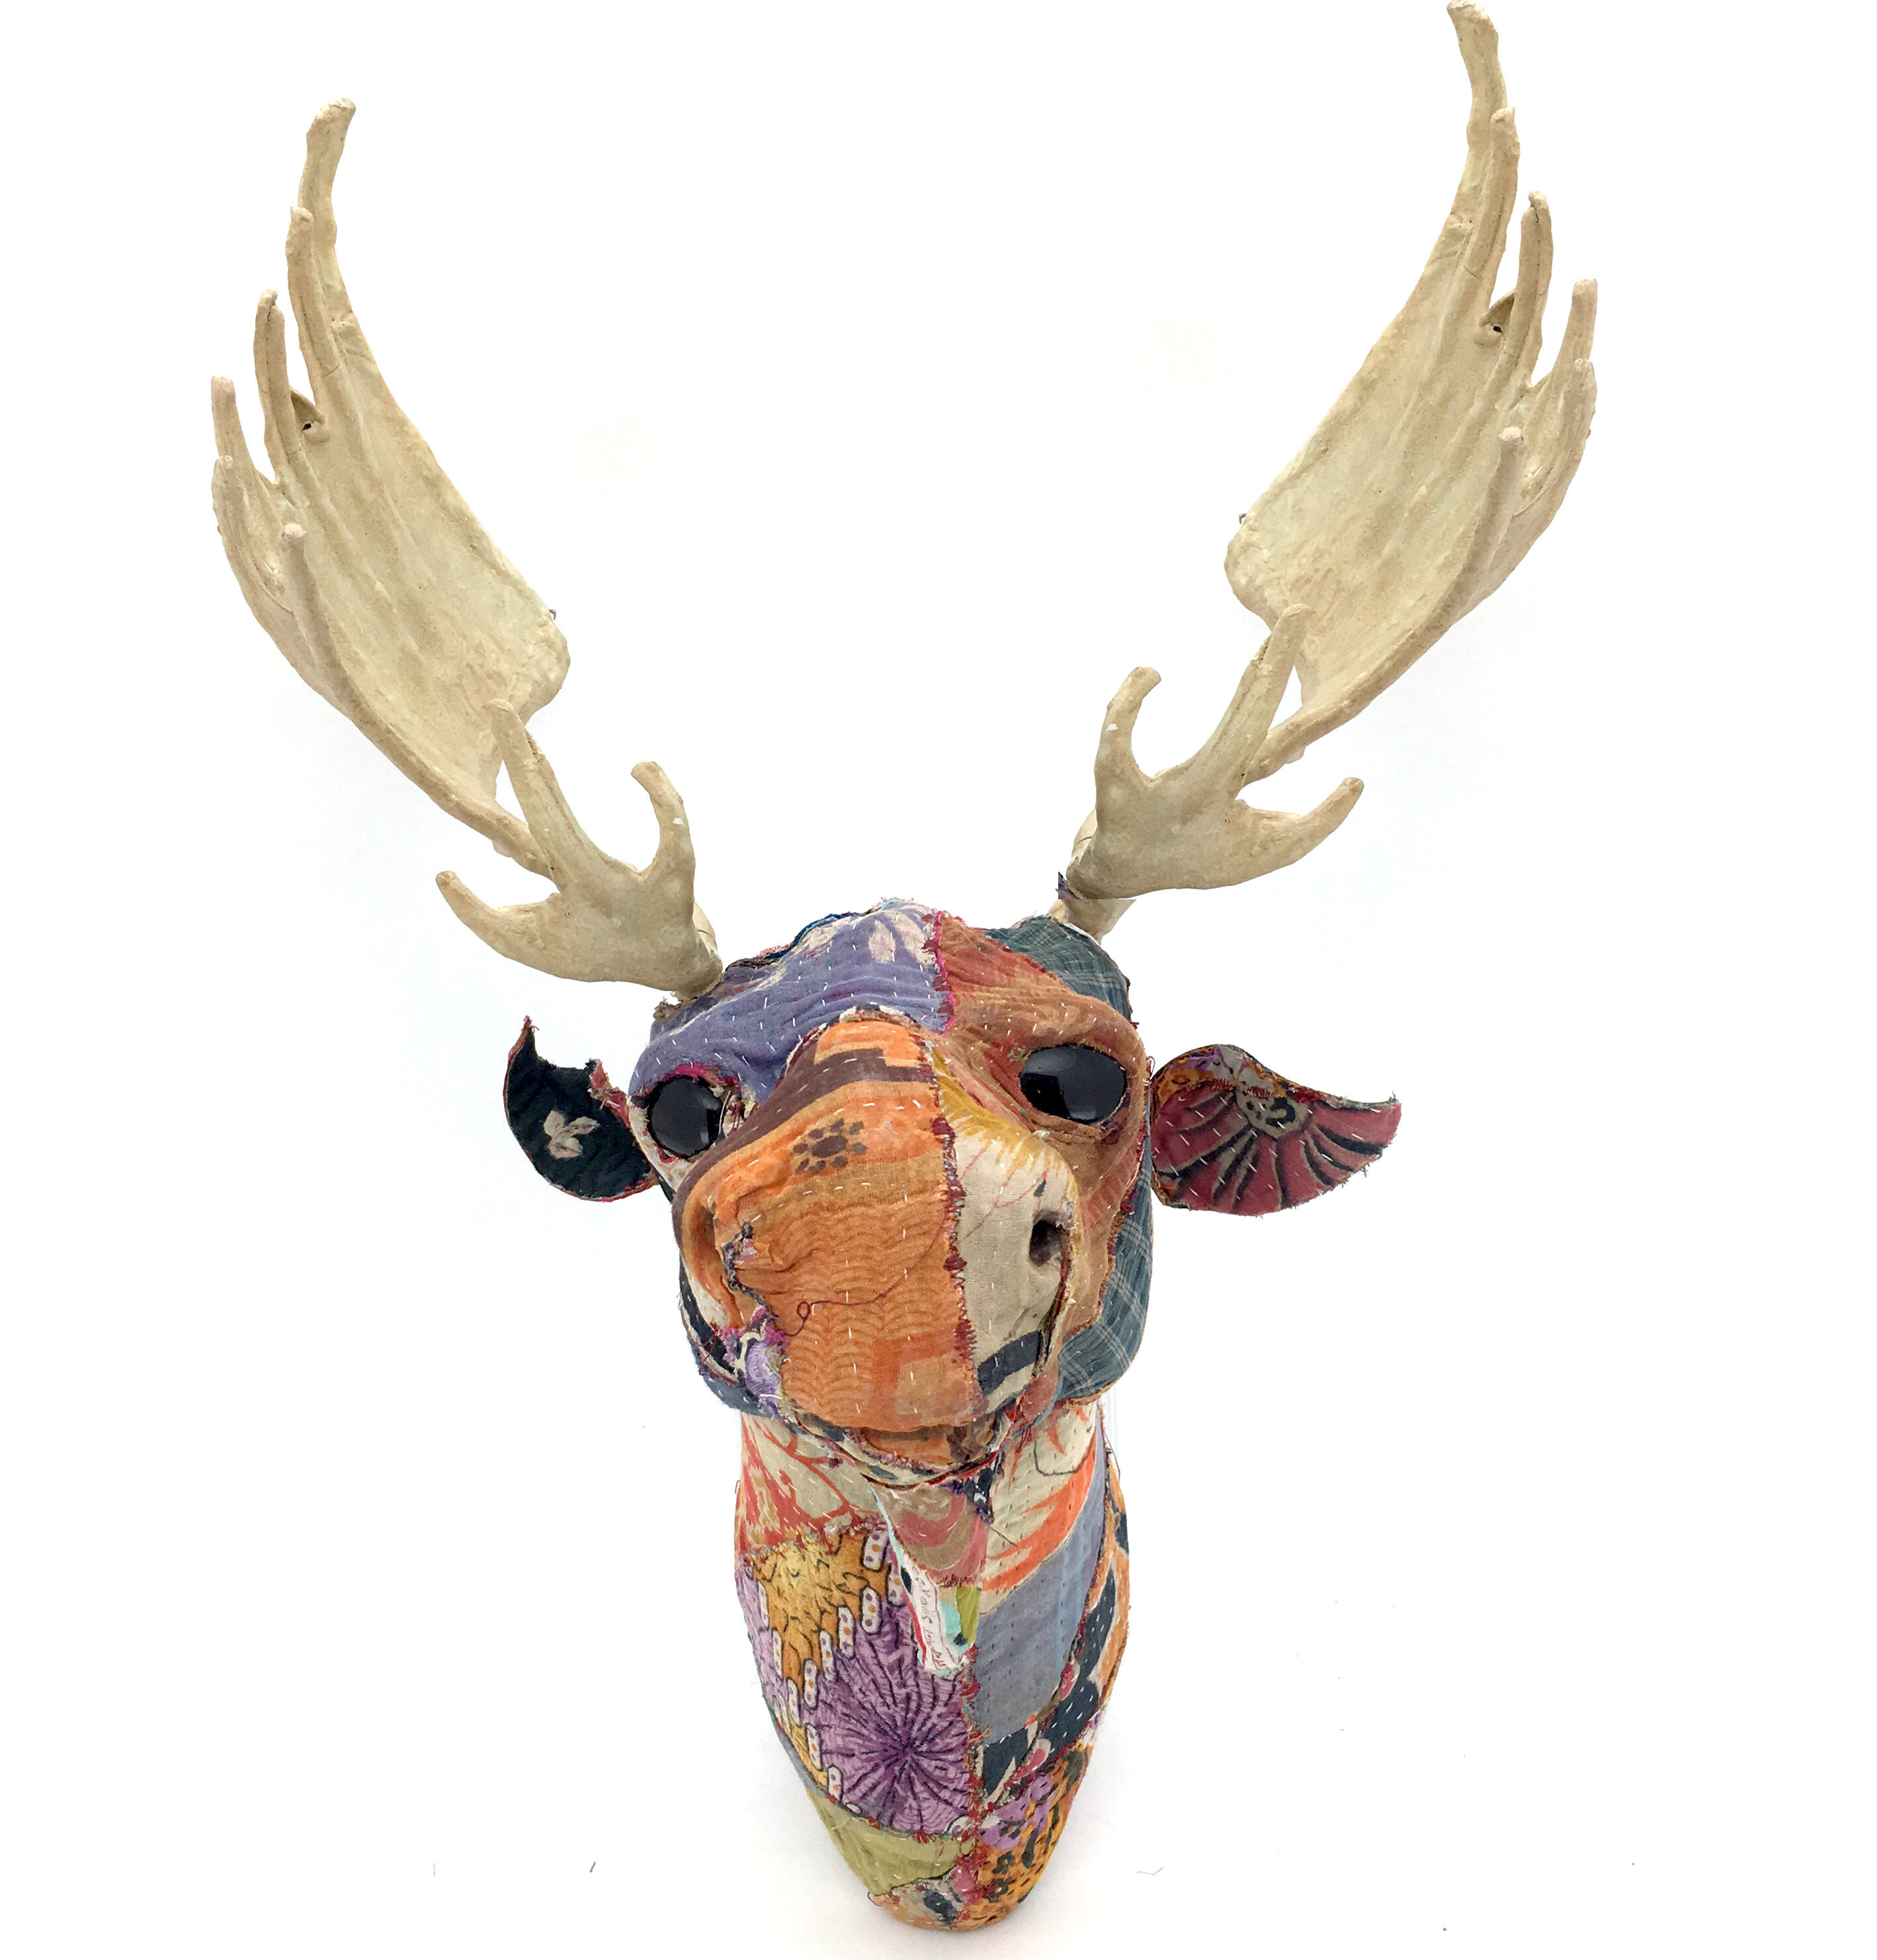 KMPG Vintage Sari Fabric Moose Head Wall Décor   Wayfair